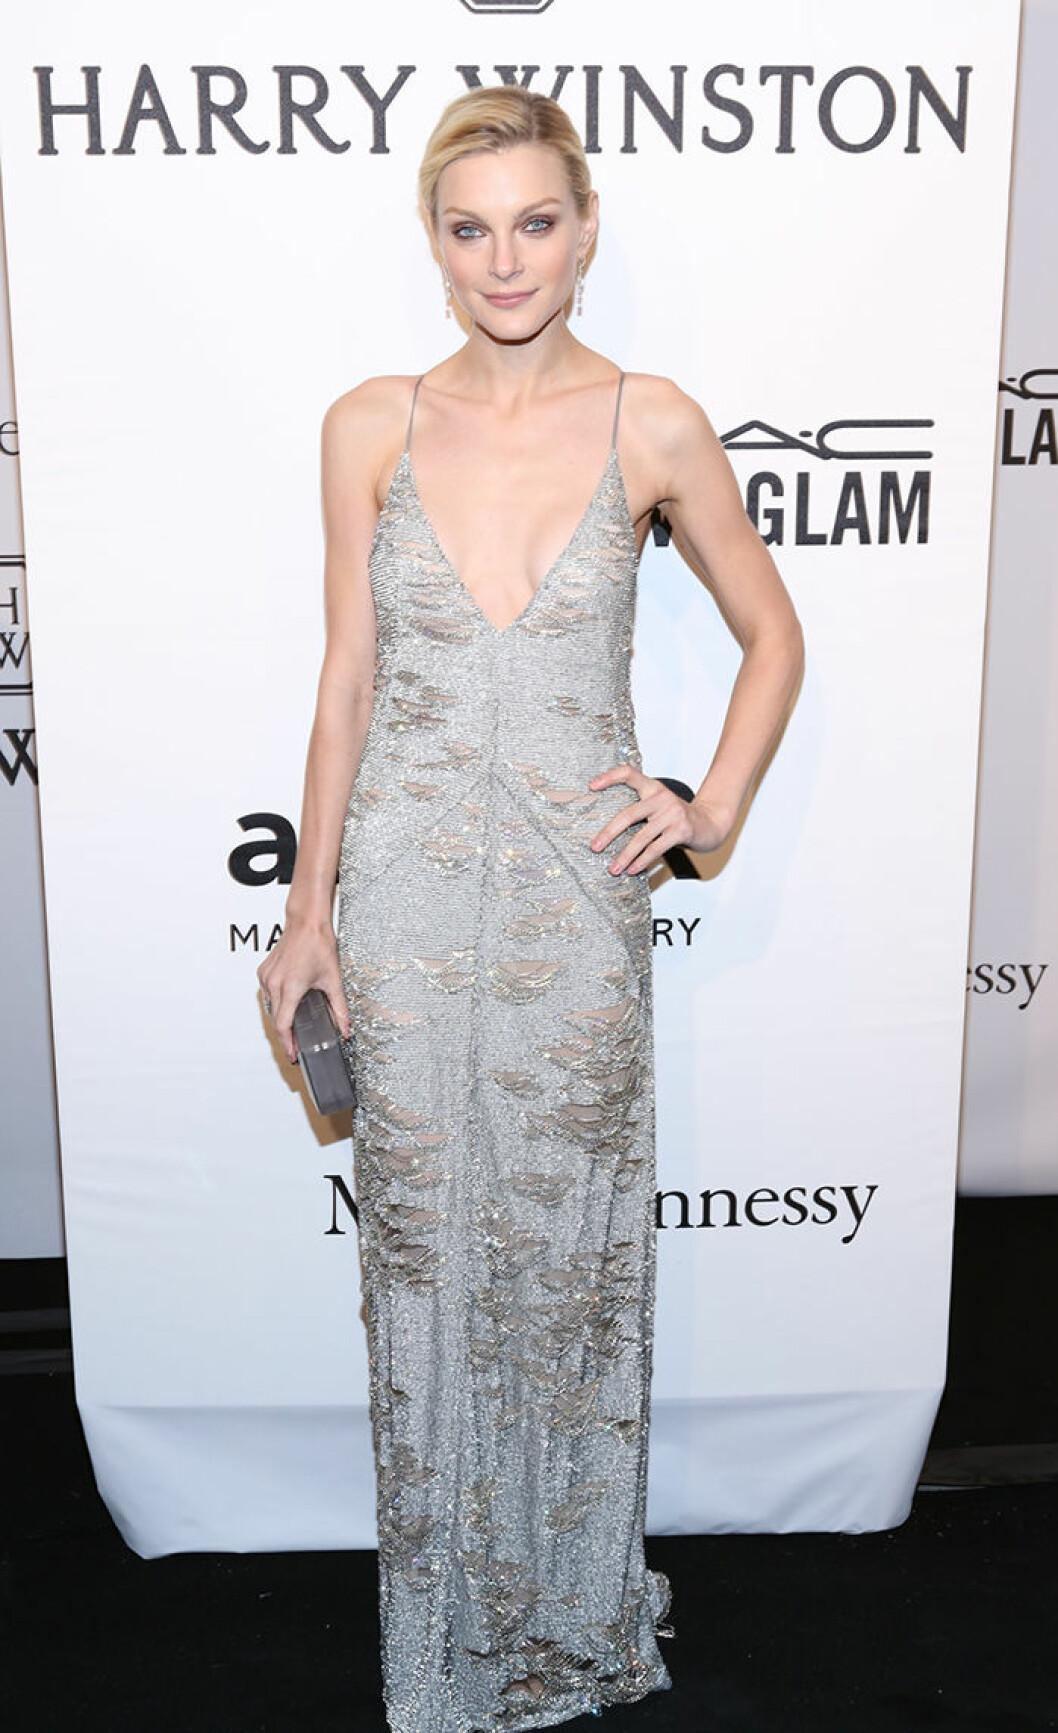 Jessica Stam seen attending the 2015 amfAR New York Gala at Cipriani Wall Street